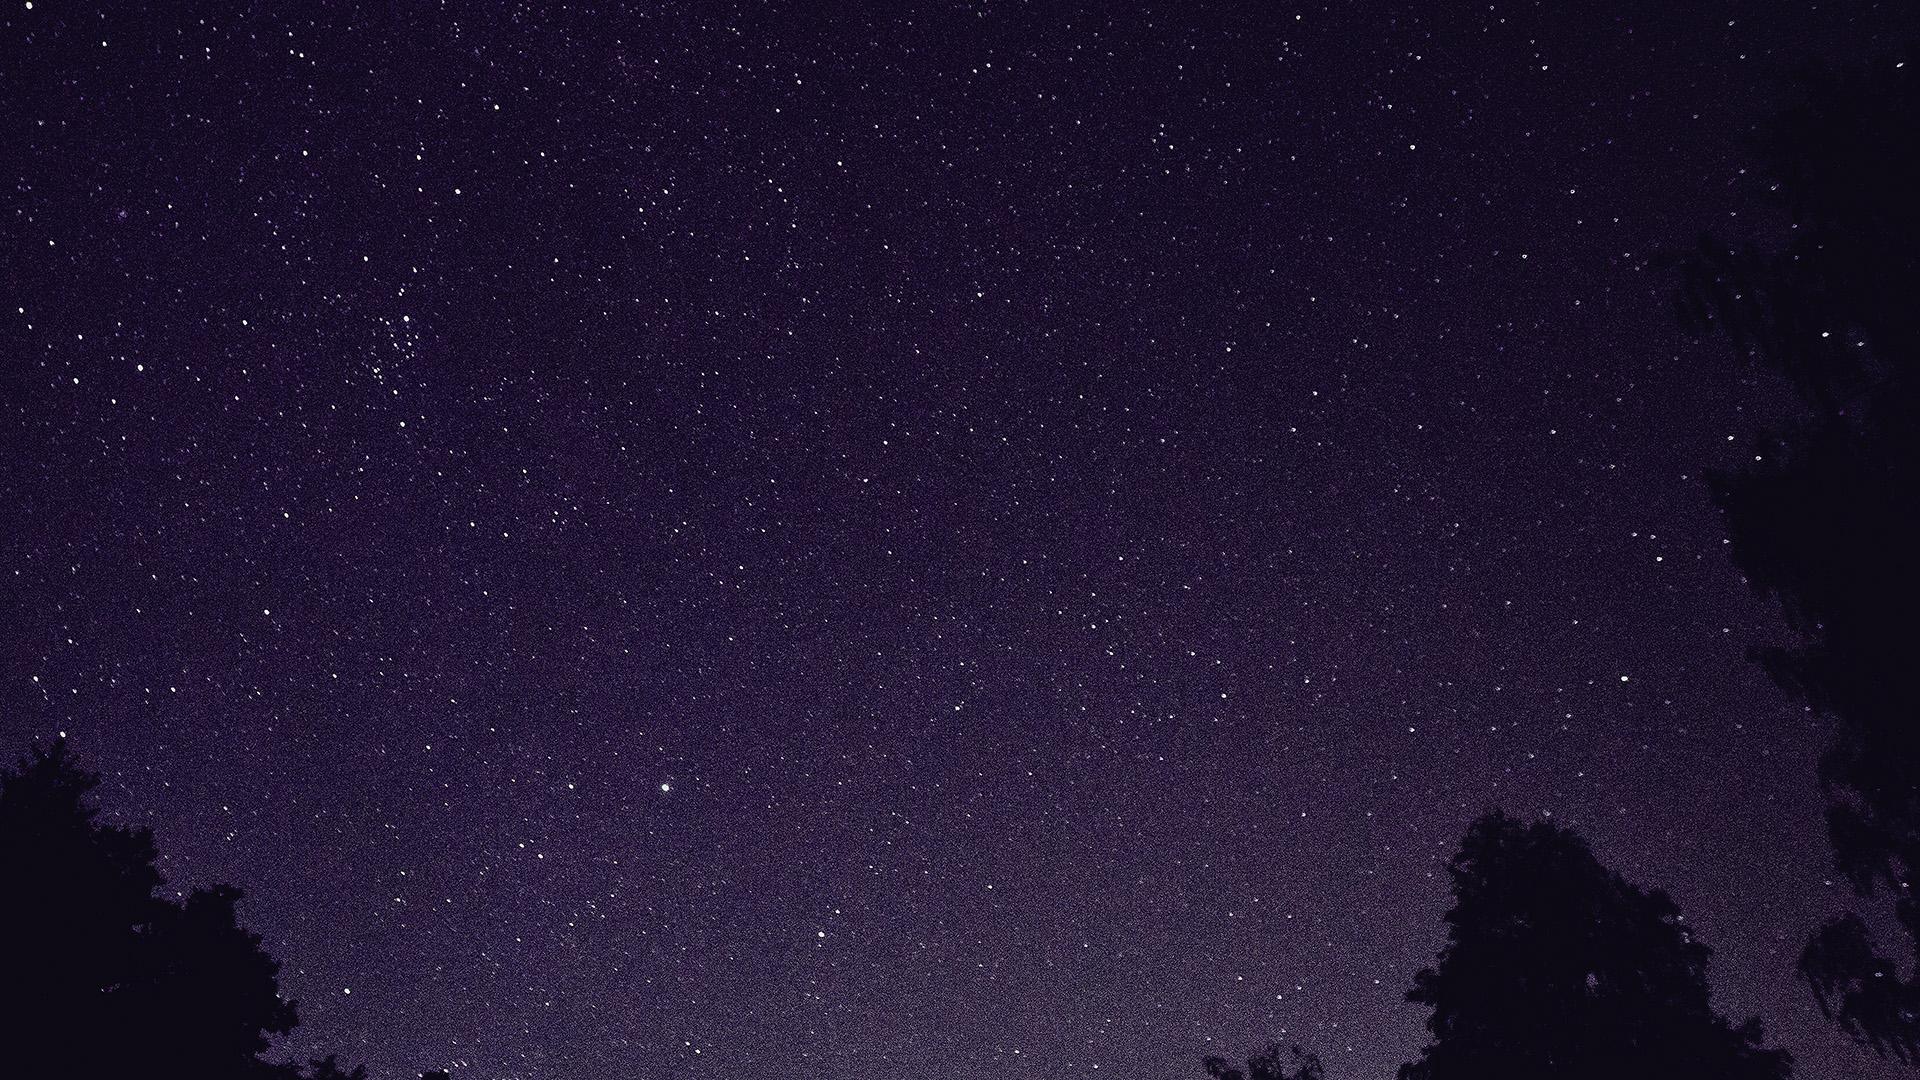 PAPERS co | desktop wallpaper | mt41-starry-night-sky-star-galaxy